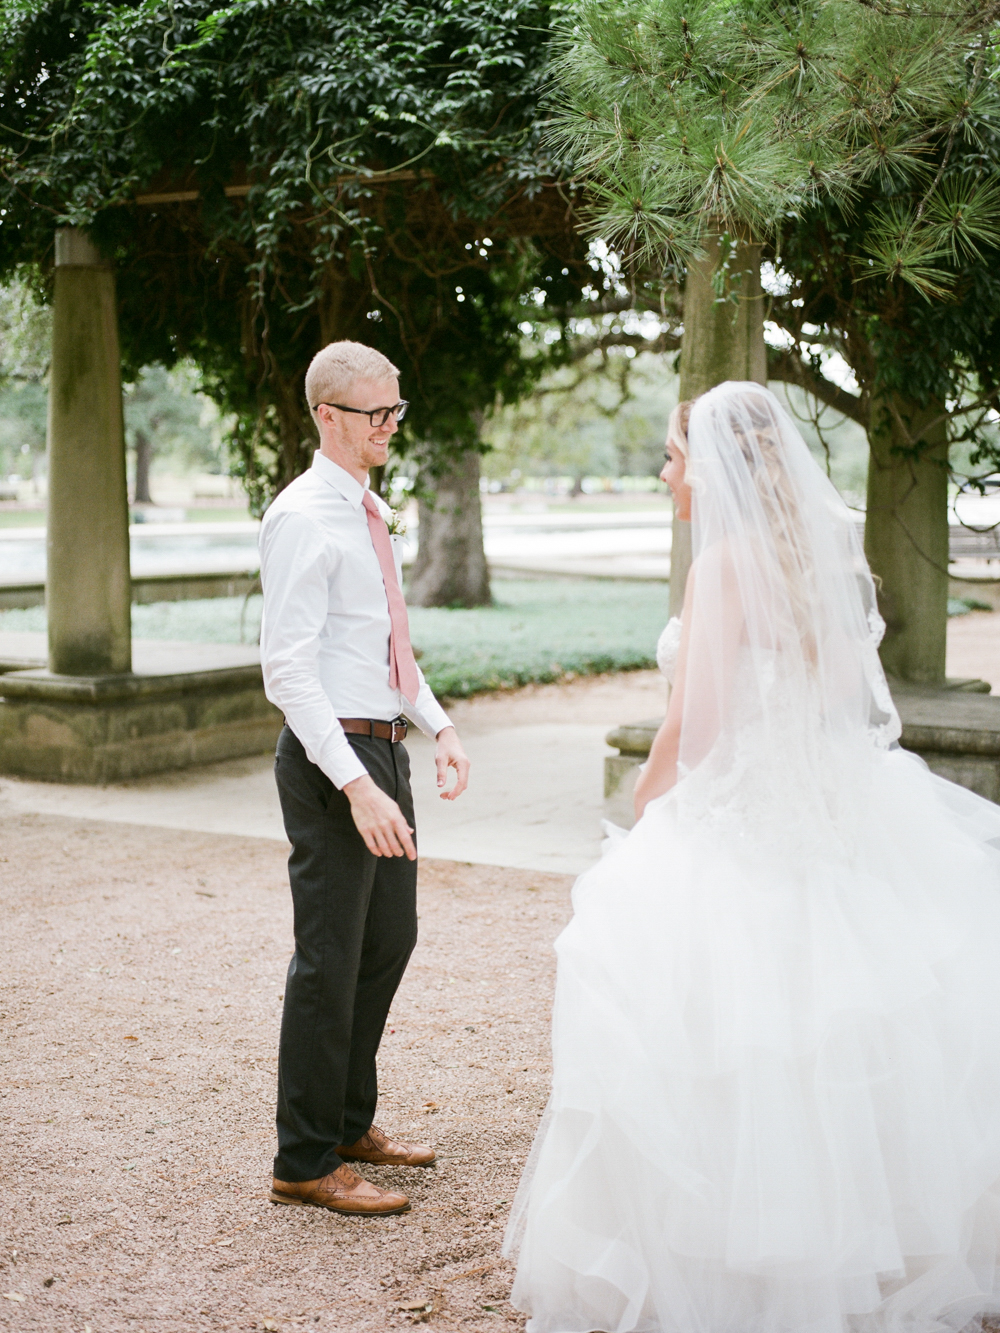 benefits of a first look_wedding photography_wedding photographer_film wedding photographer_Christine Gosch_www.christinegosch.com_Houston, Texas wedding photographer_ Houston, Texas-11.jpg